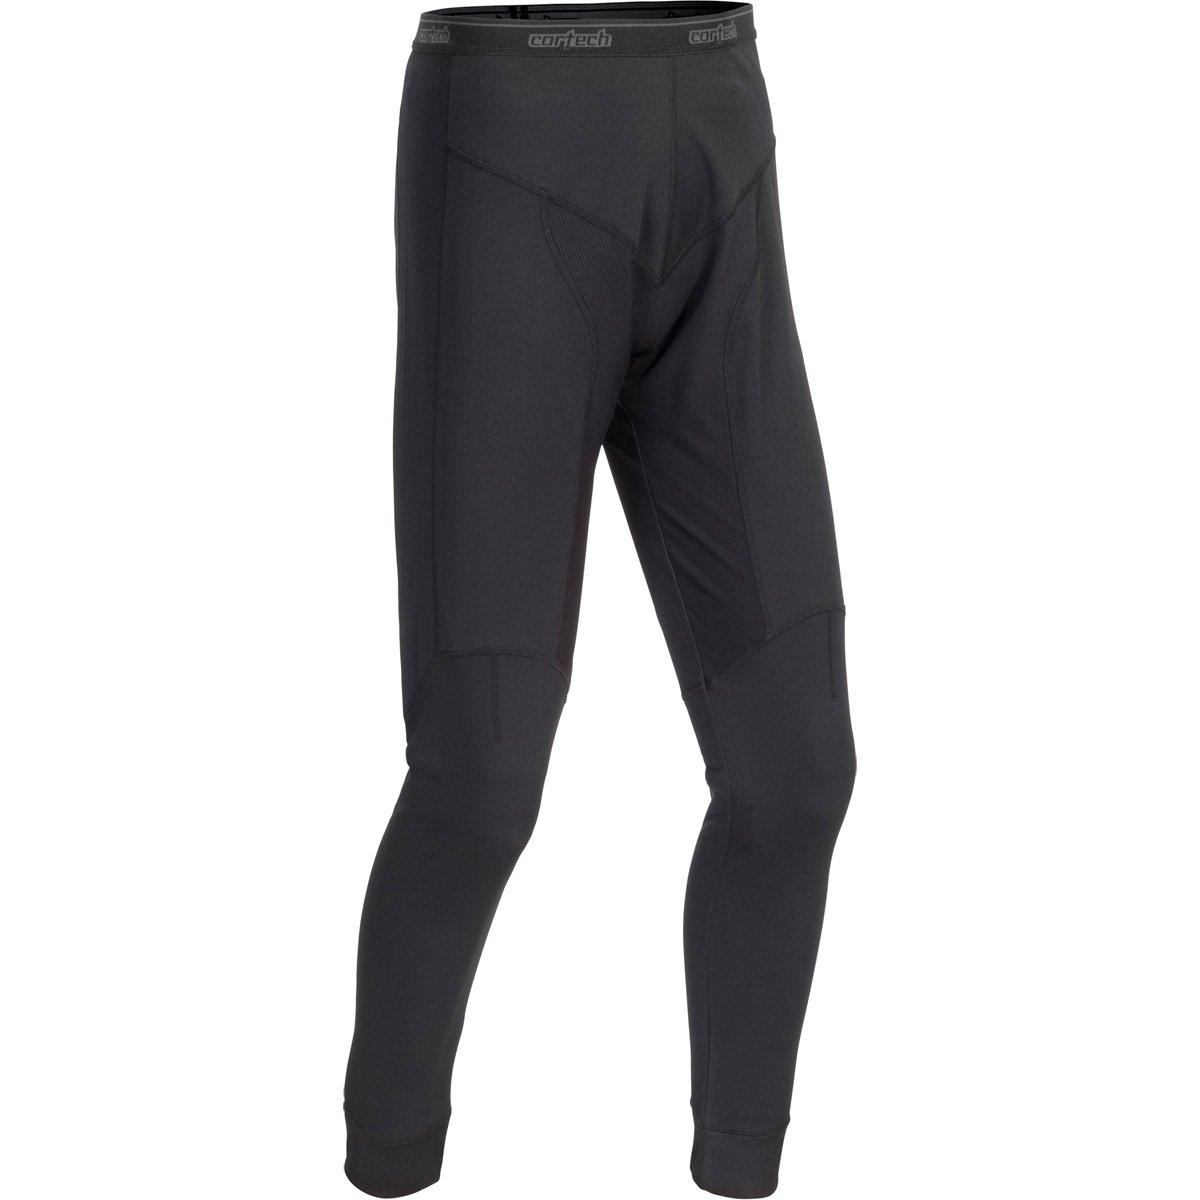 Cortech Journey Coolmax Pant Base Layer